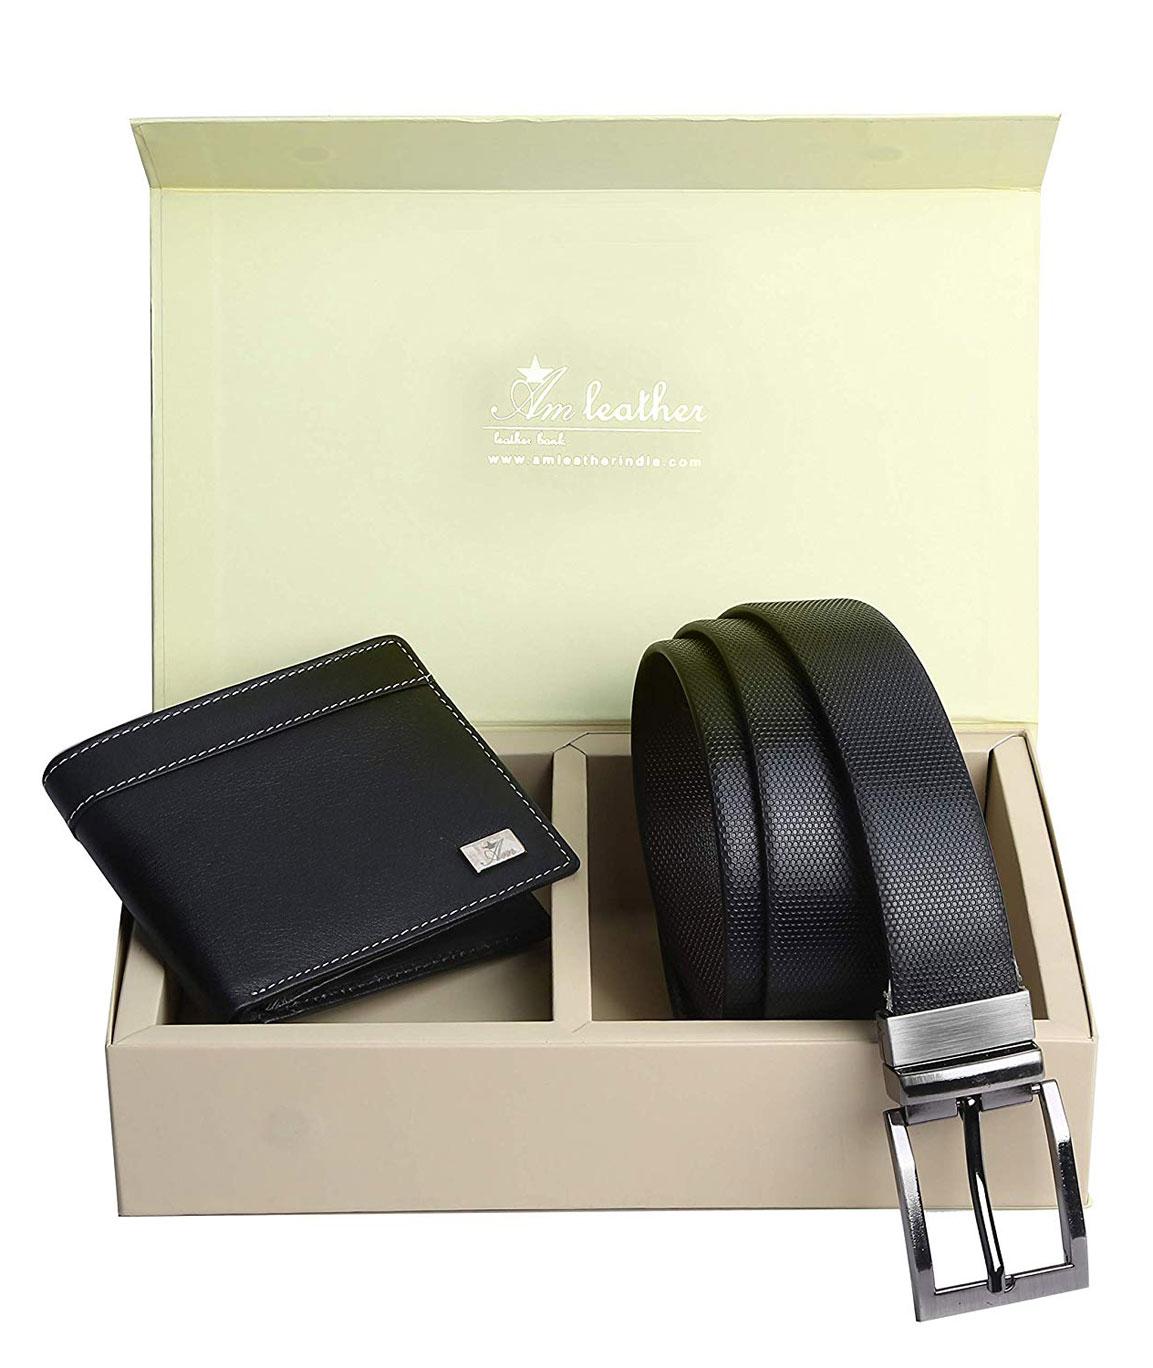 AM LEATHER Marena Style (Wallet + Belt) Combo Corporate Gift (White Thread Blackk)